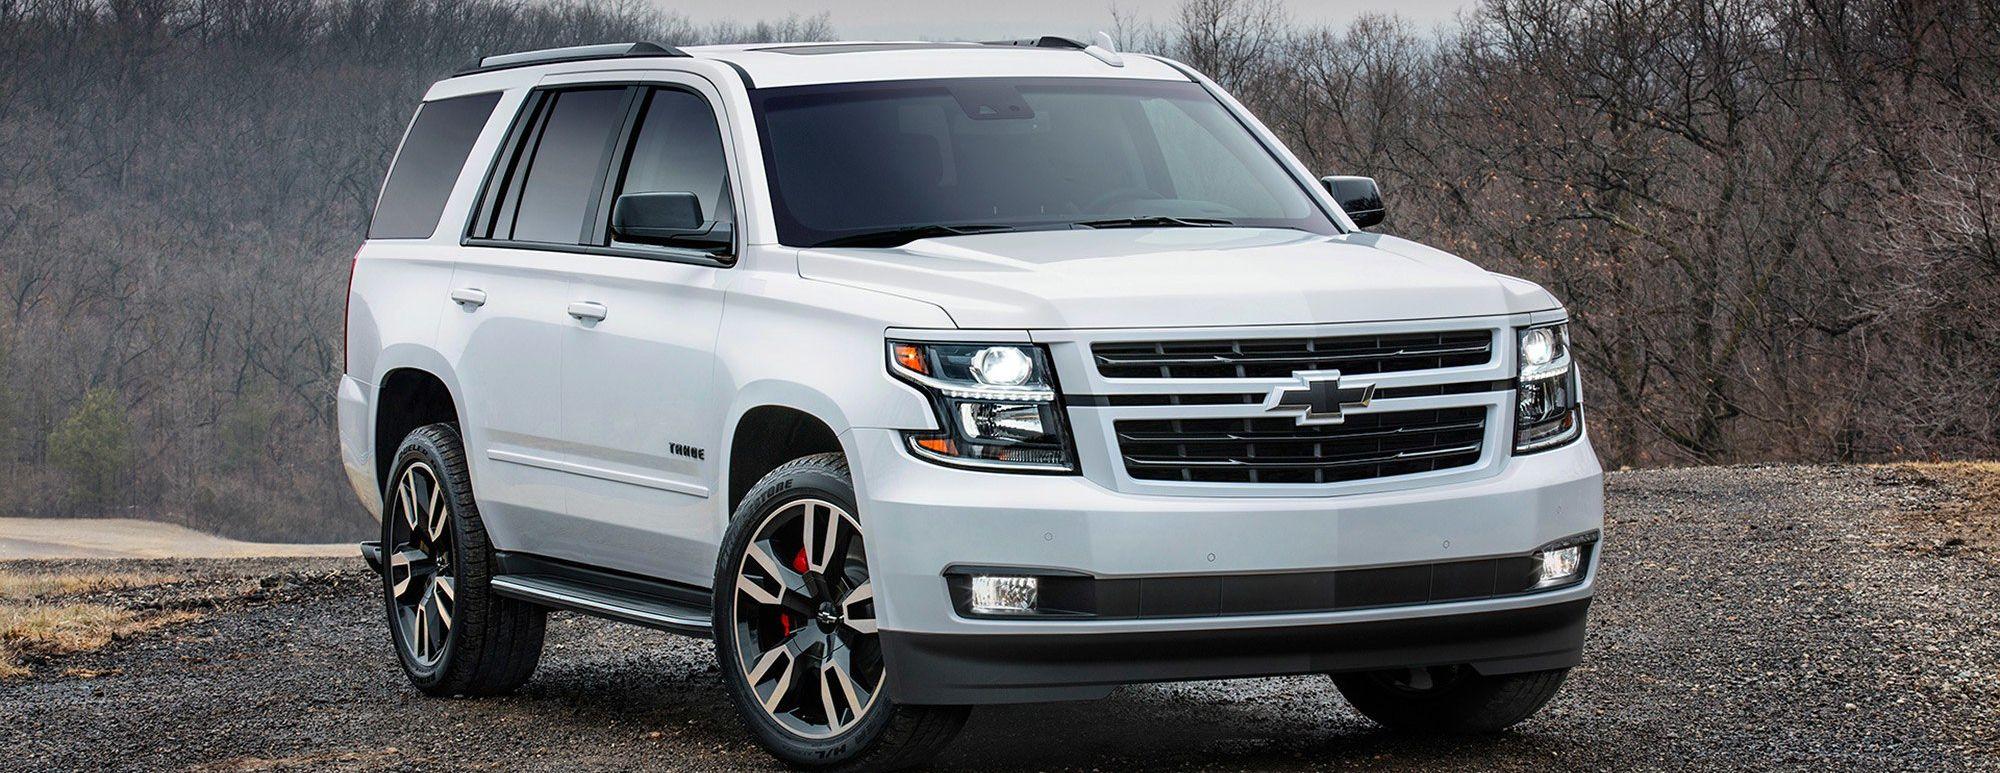 2019 Chevrolet Tahoe for Sale near Lansing, MI - Art Moehn Auto Group